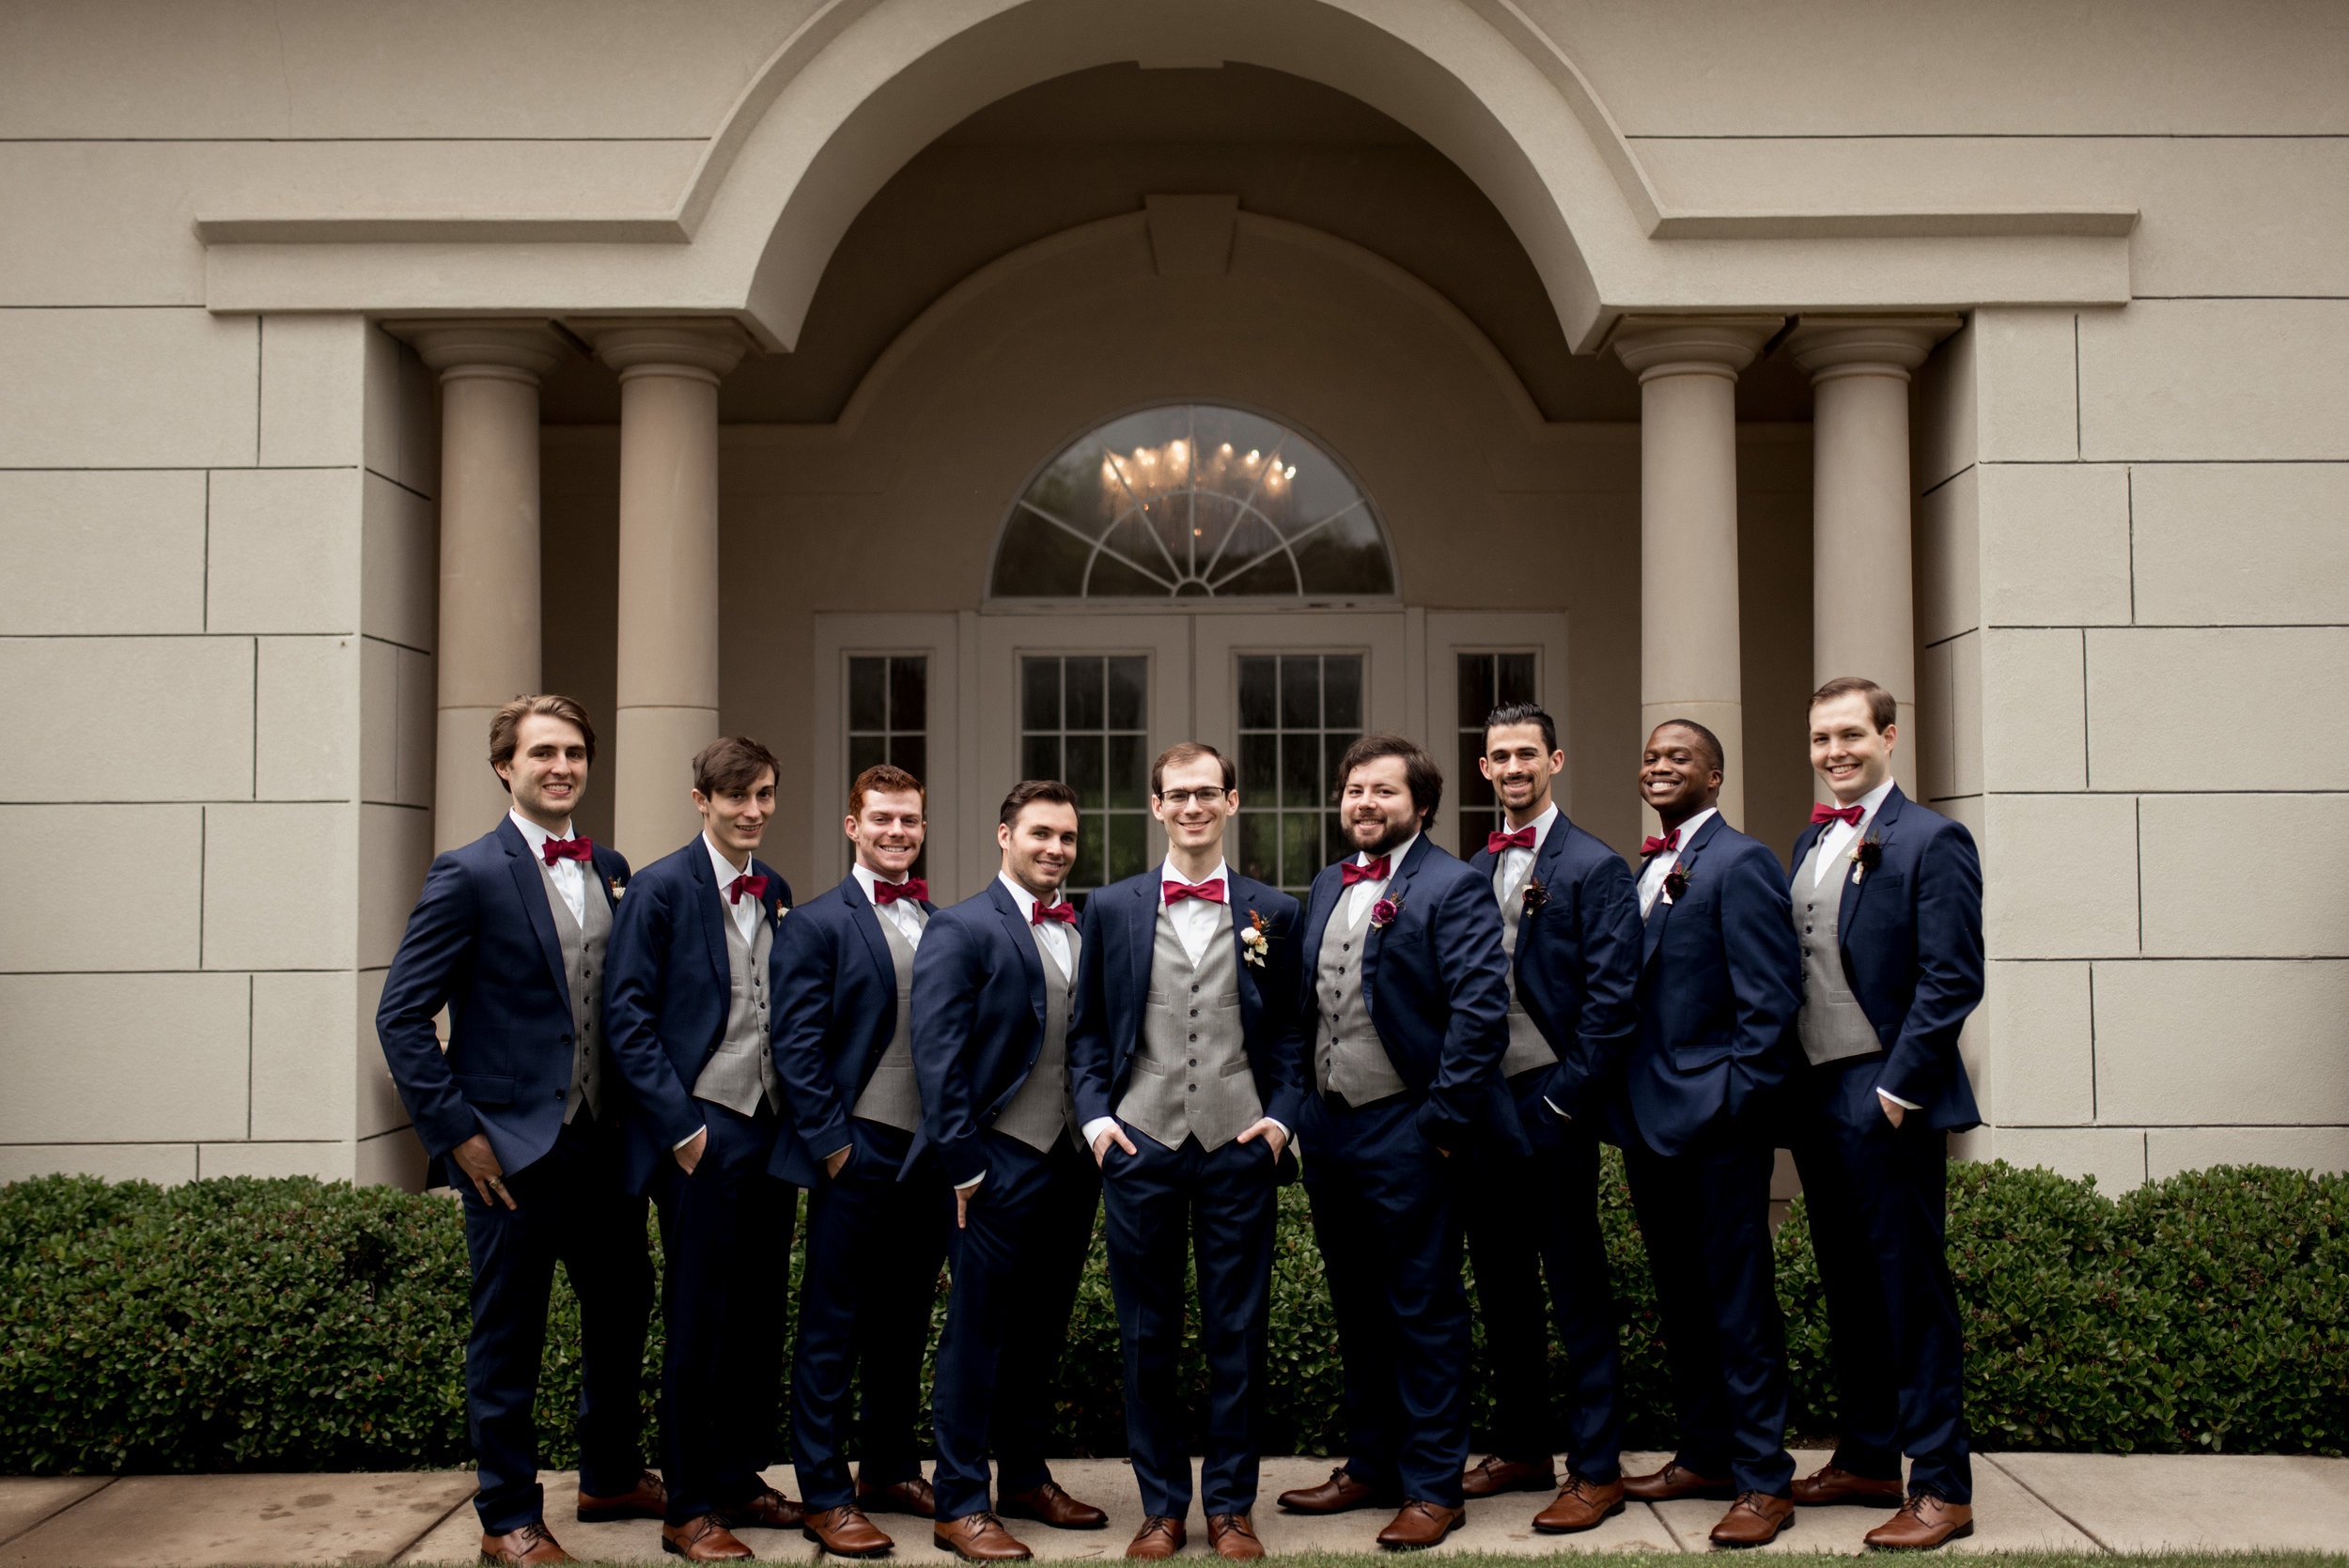 Artigues Wedding-161.jpg